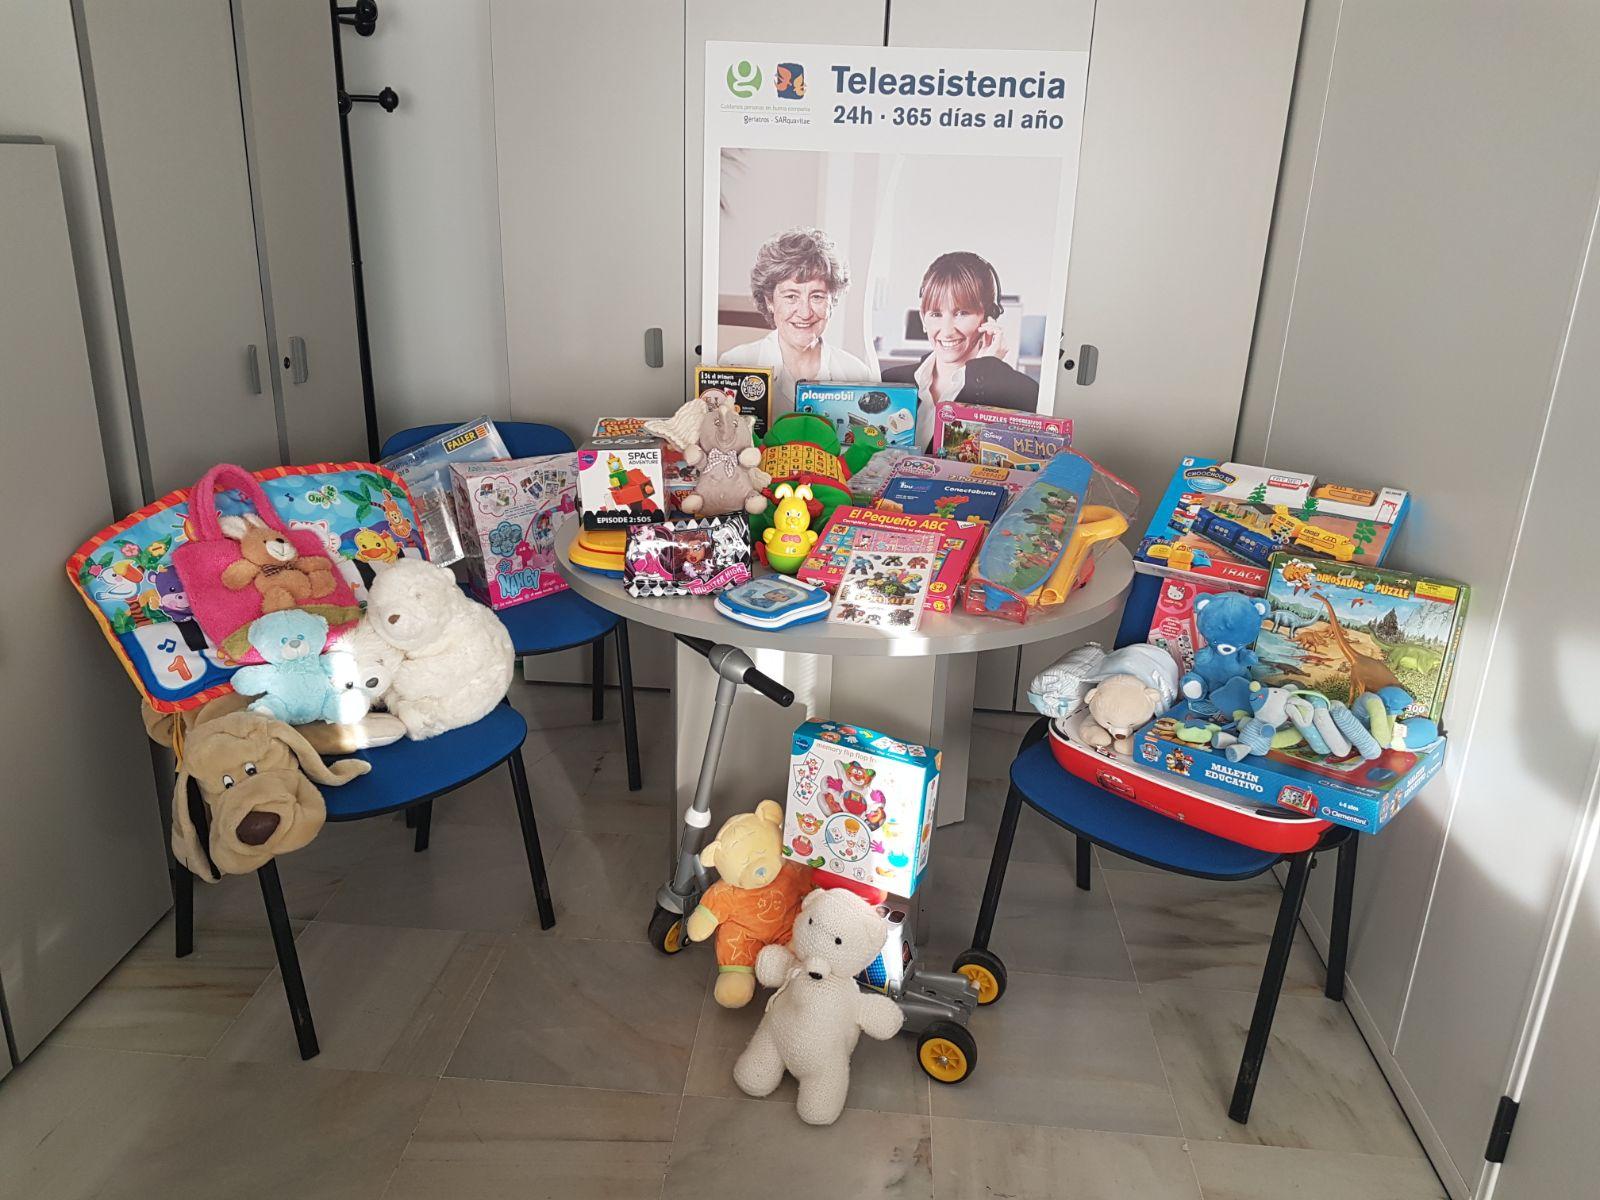 Asociaciones de recogida de juguetes en madrid